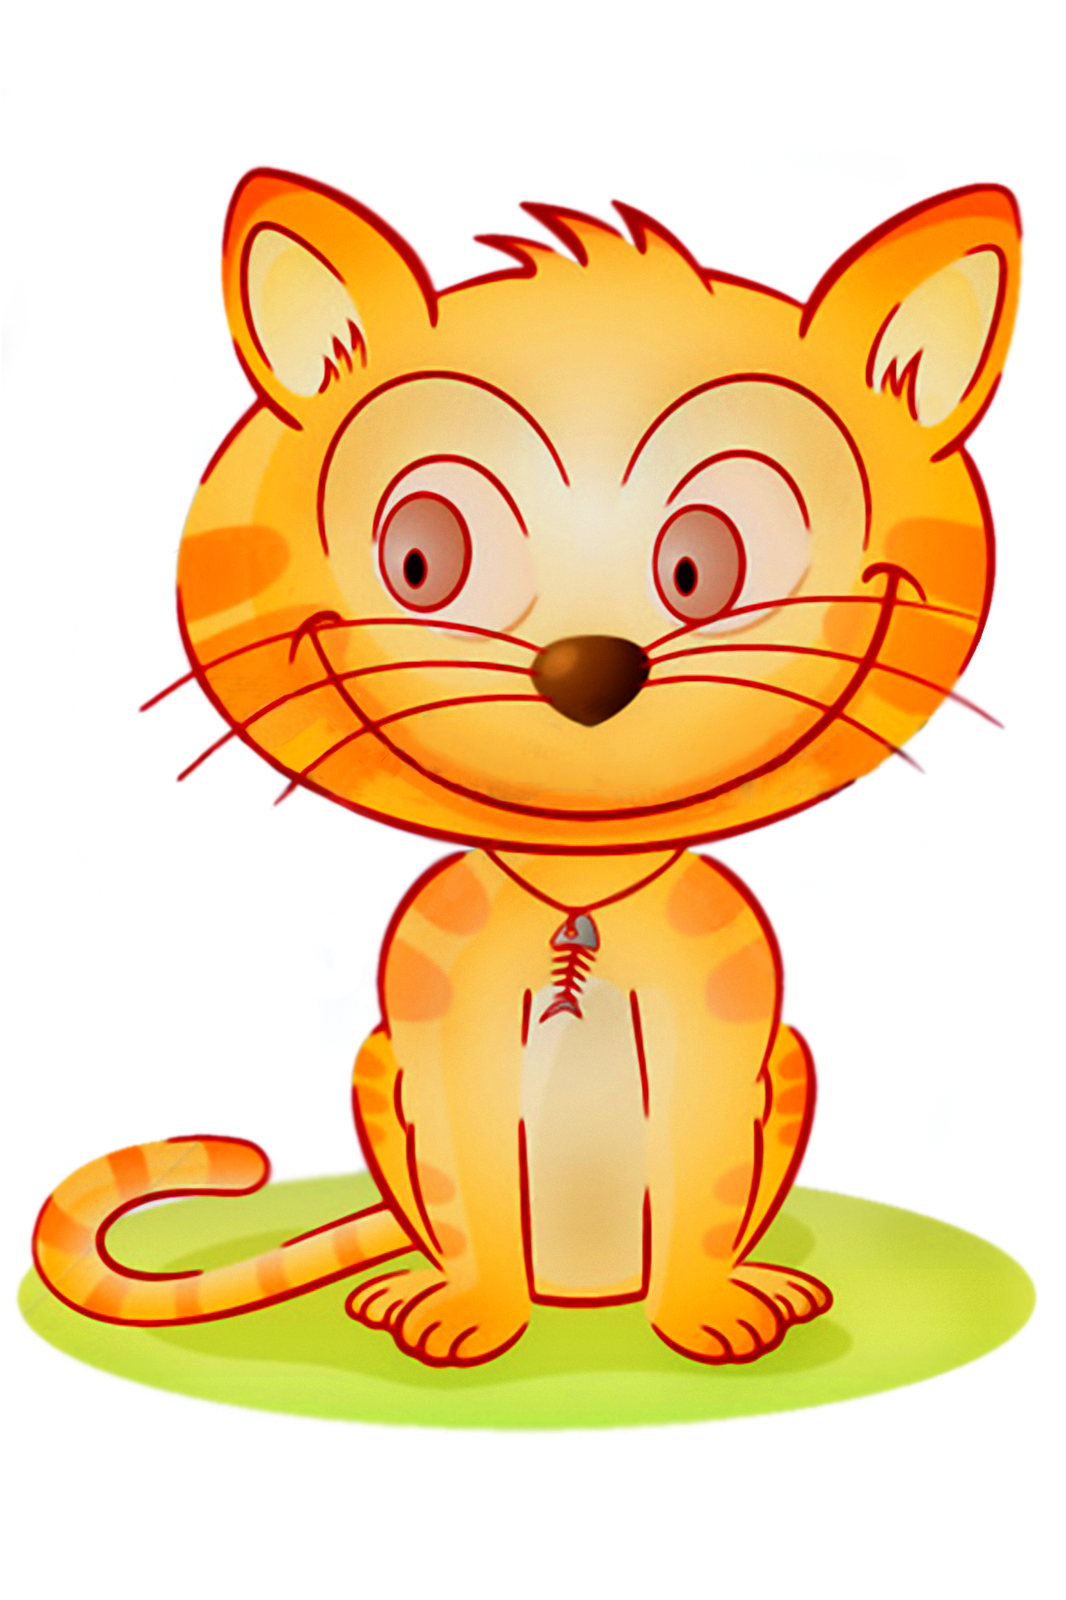 Gifs de gatos infantiles fondos de pantalla y mucho m s - Dibujos de gatos pintados ...